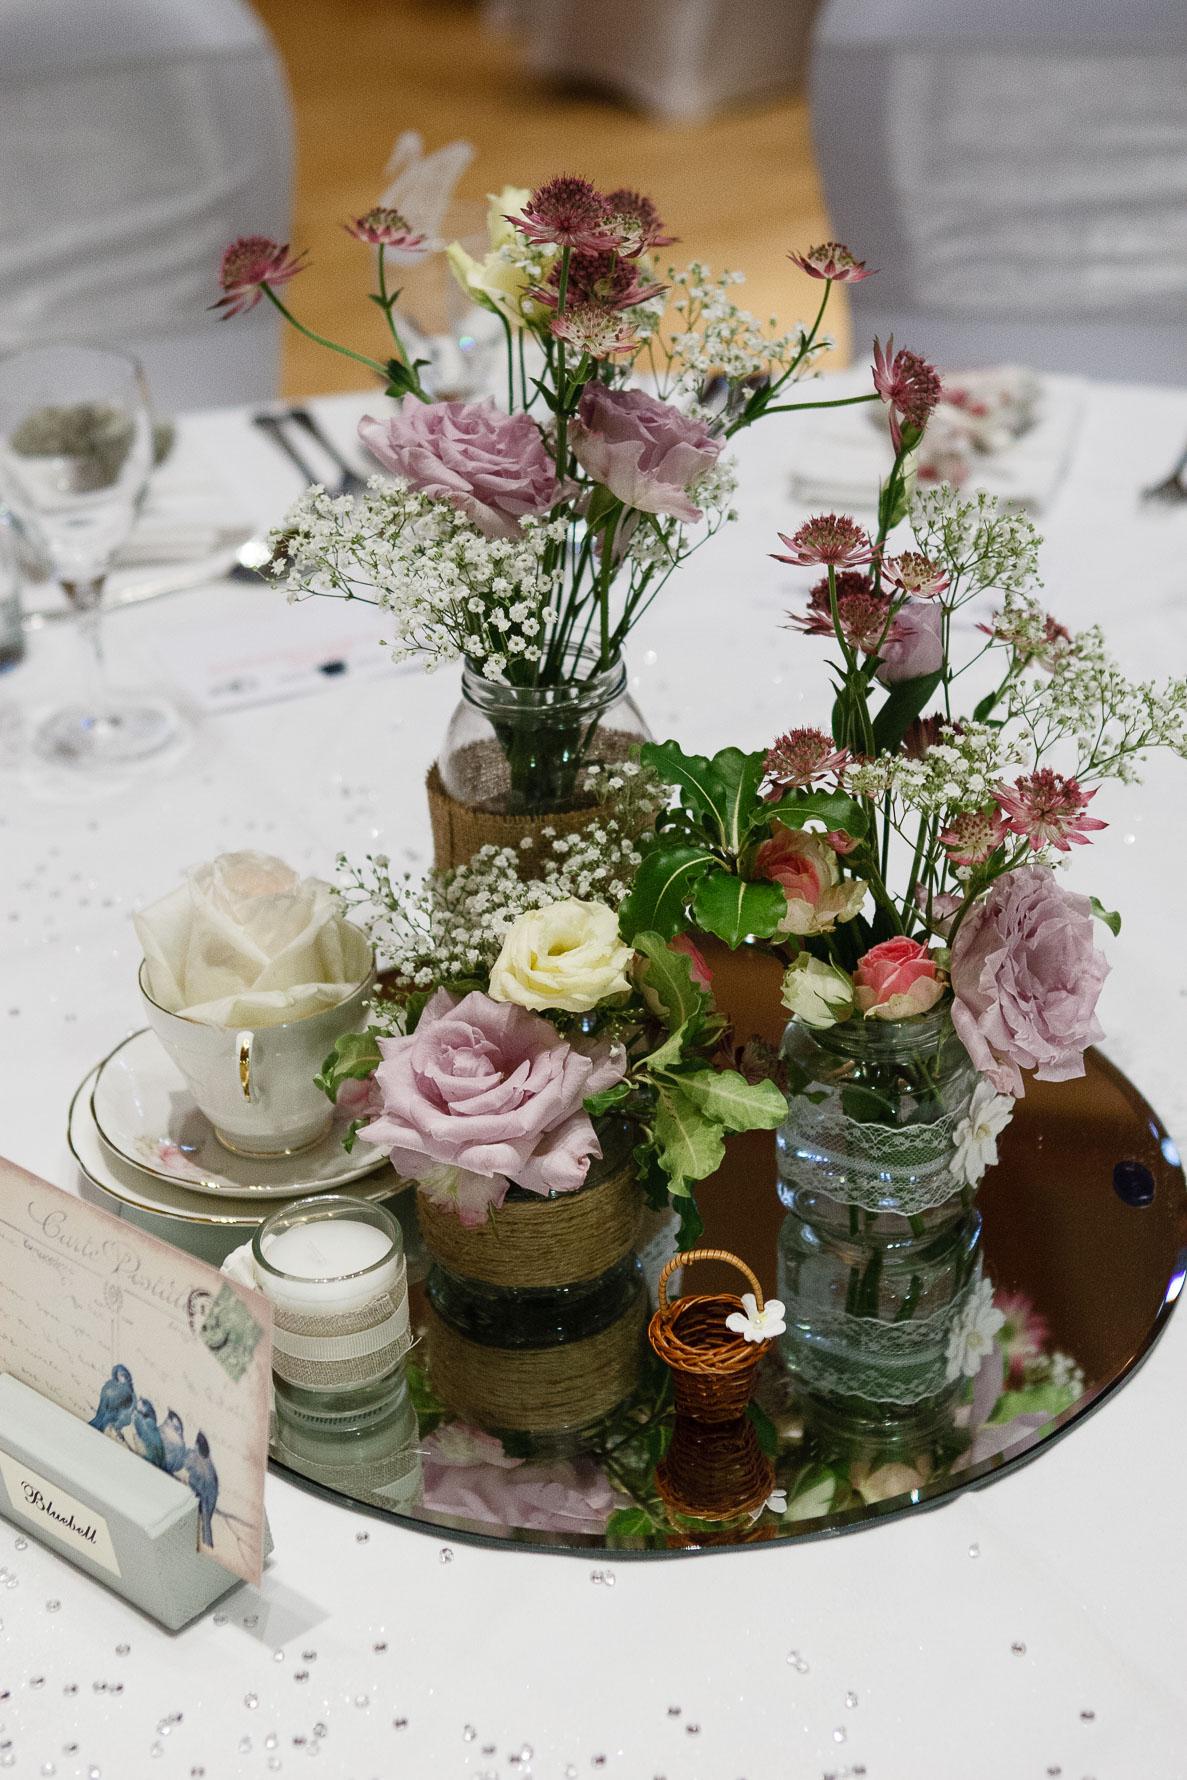 Canterbury Cathedral Lodge Wedding55-20141004 0861